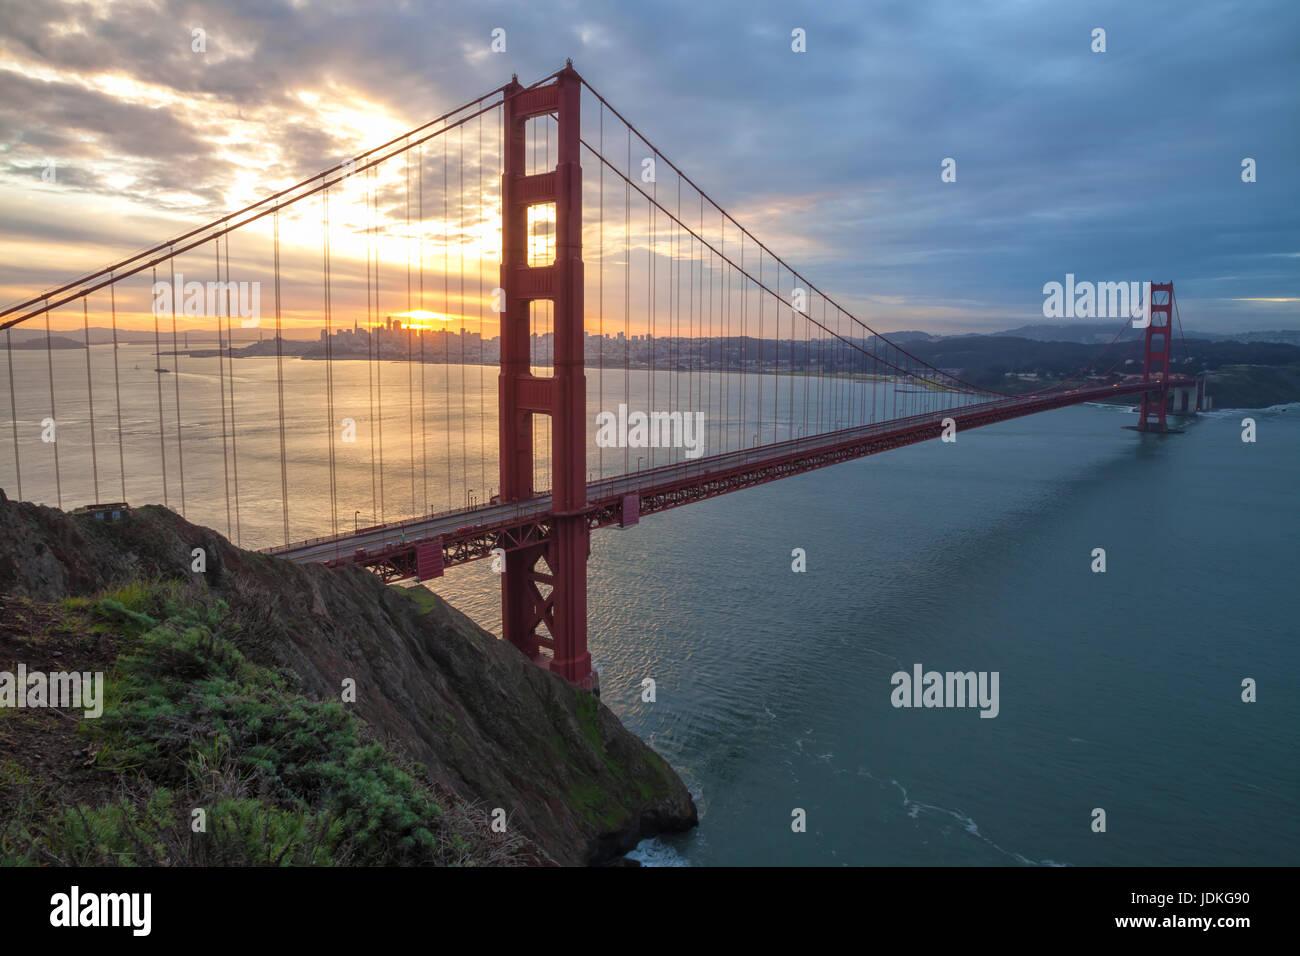 Puente Golden Gate al amanecer. Imagen De Stock